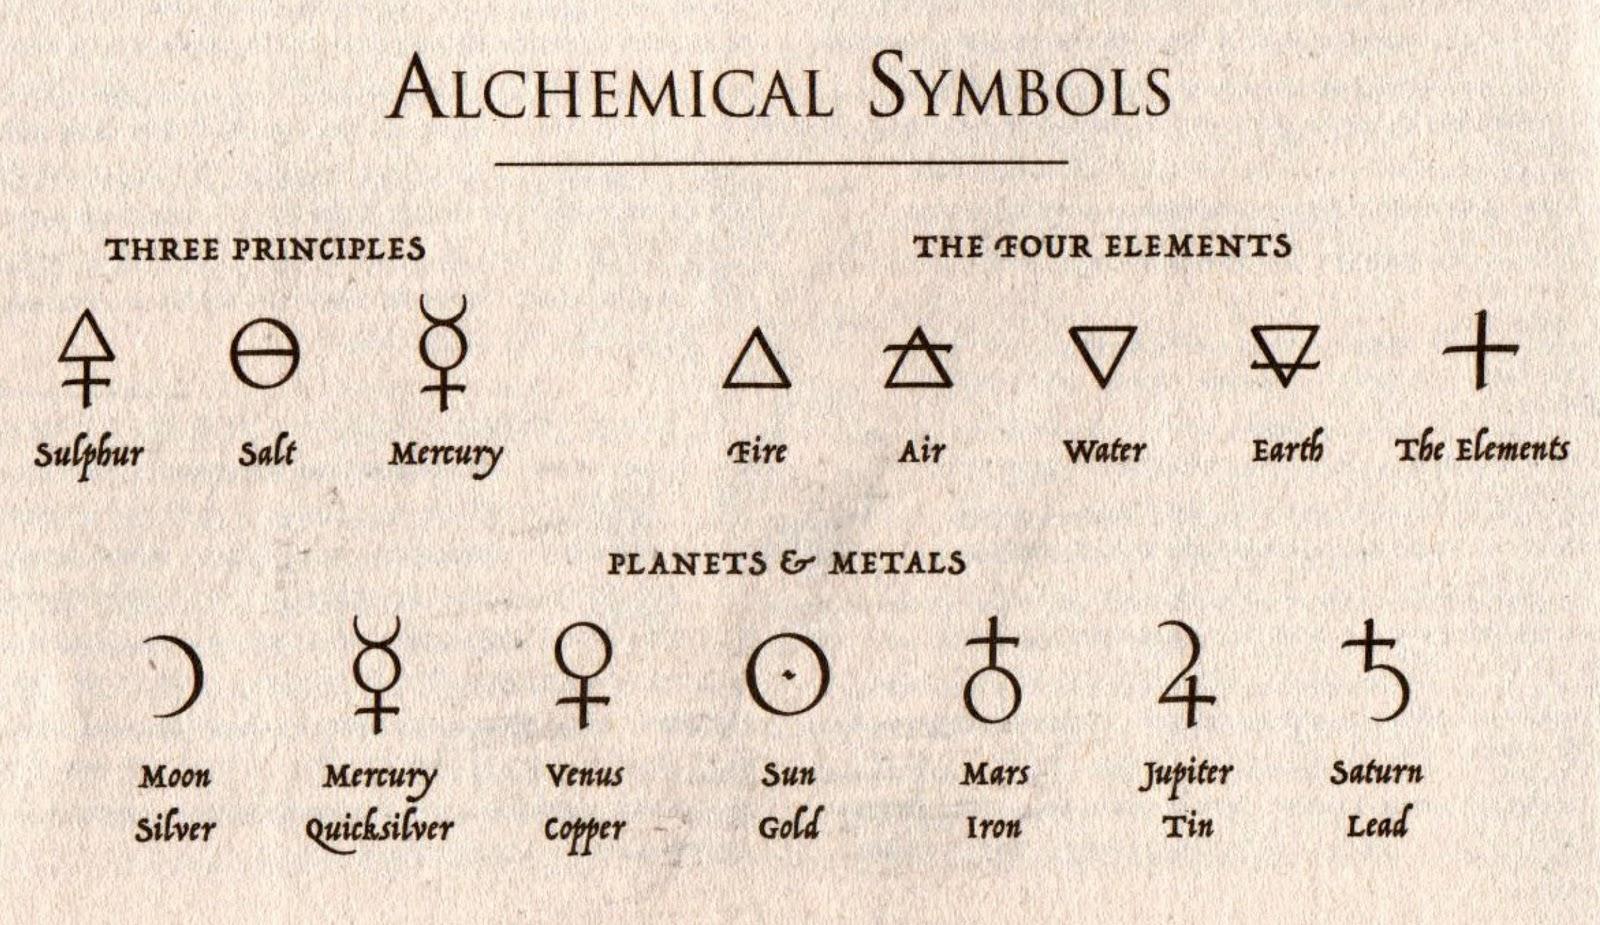 pinakas_alchemy.jpg